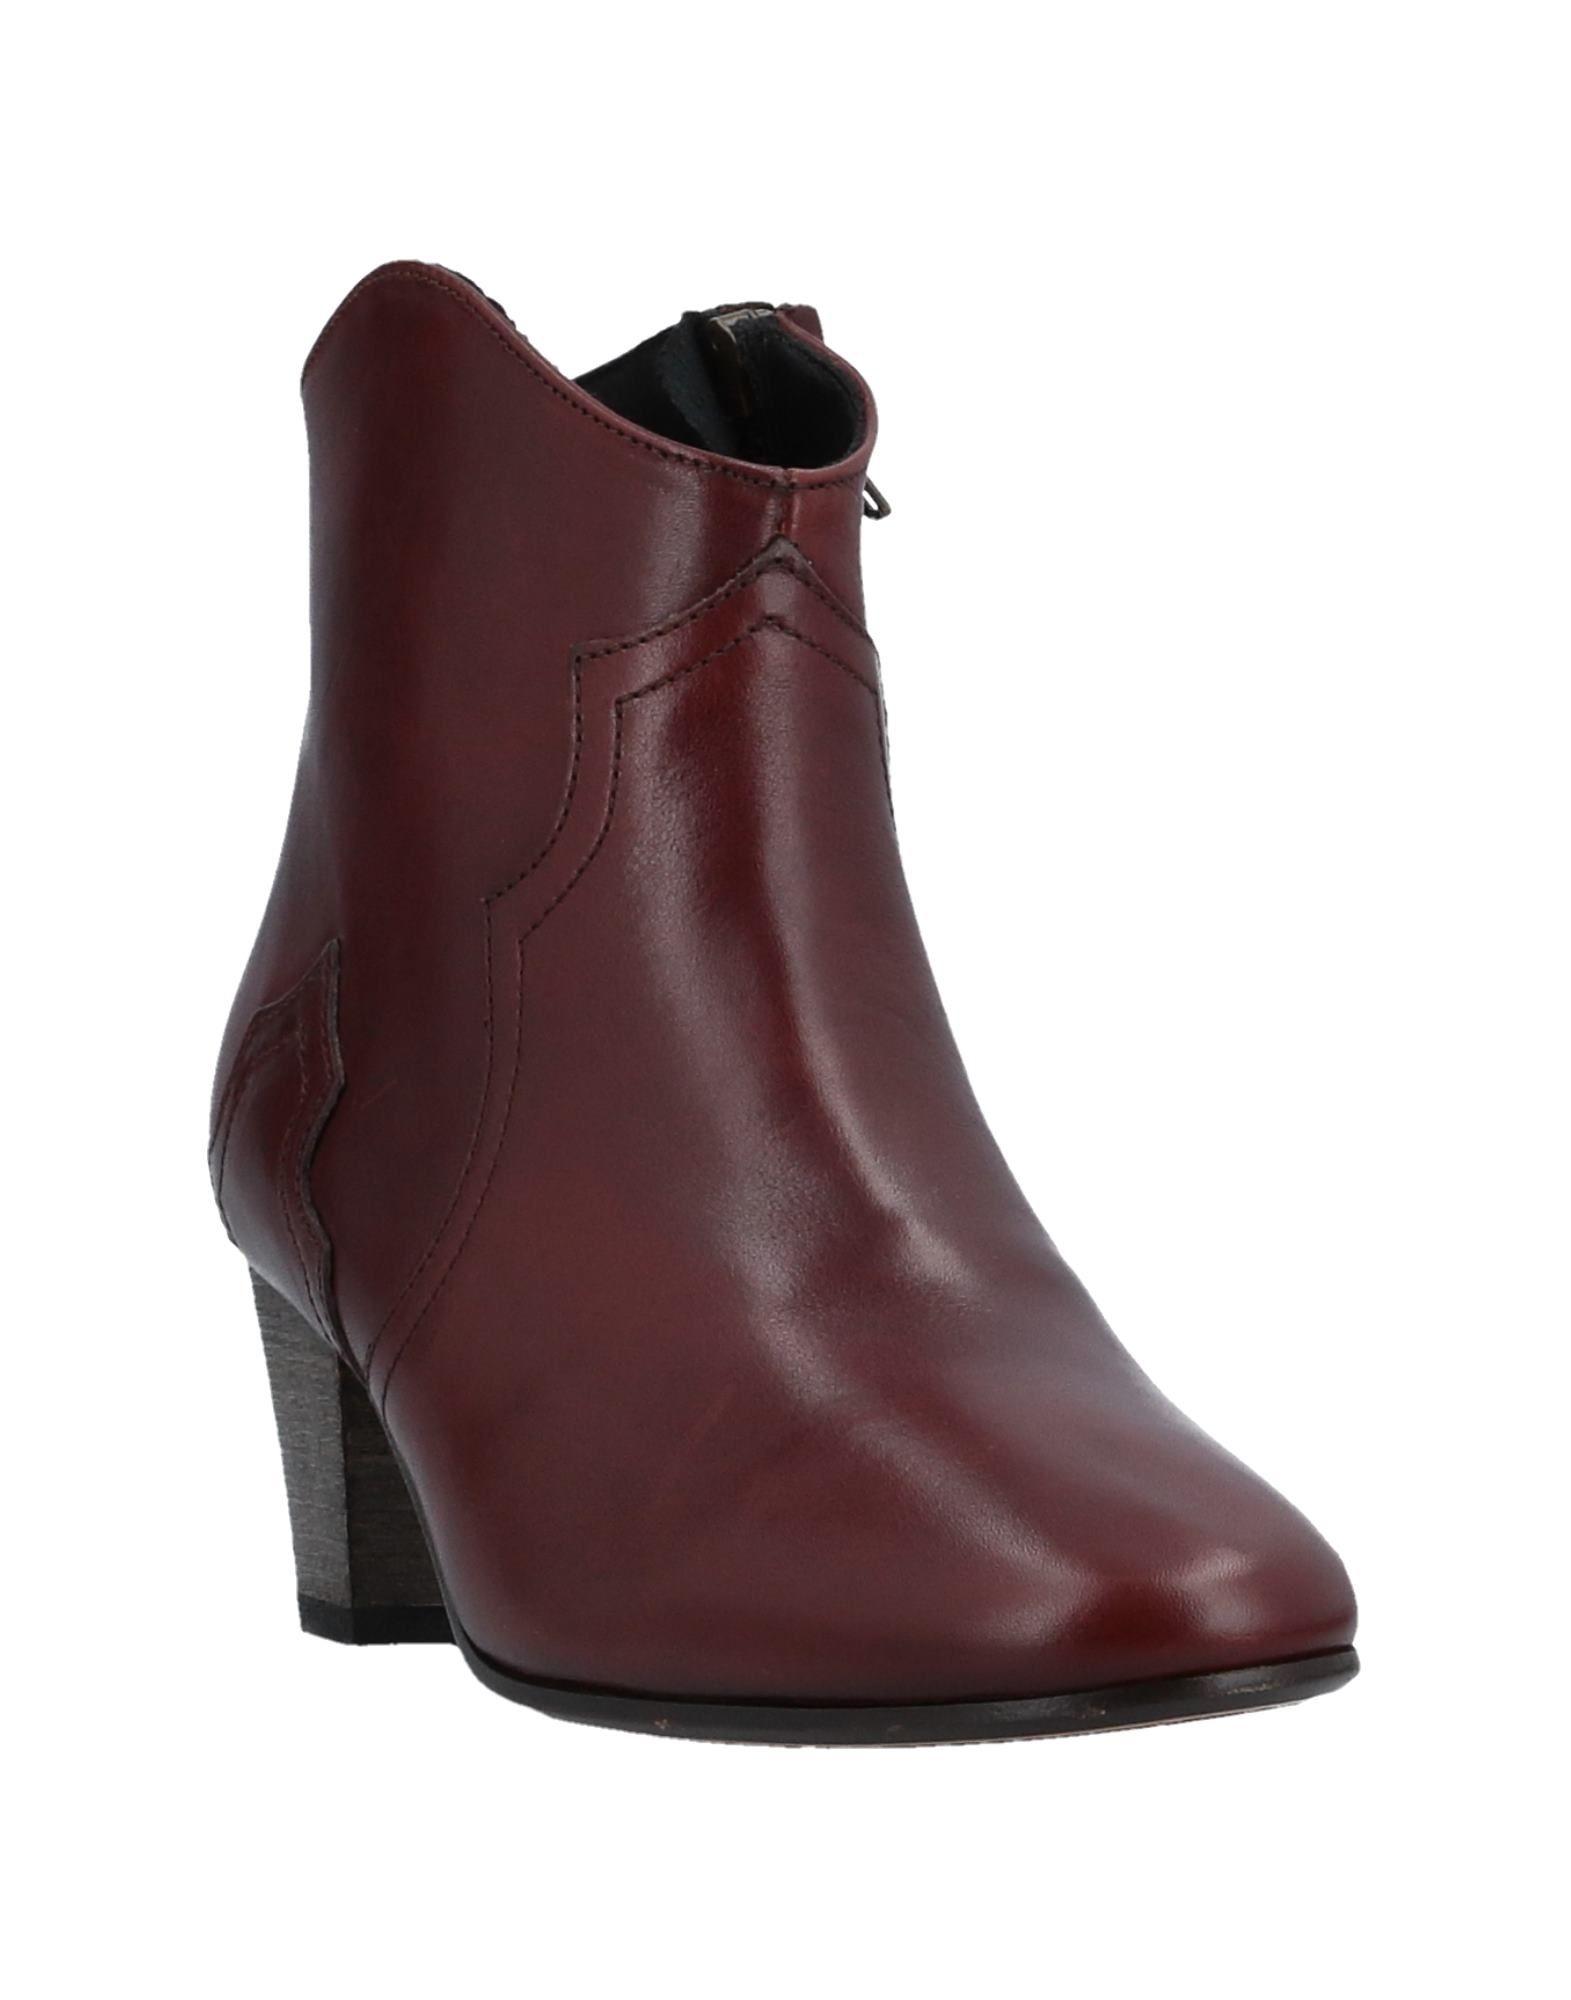 Isabel Marant Stiefelette 11508673KM Damen  11508673KM Stiefelette Neue Schuhe 7ba9b2